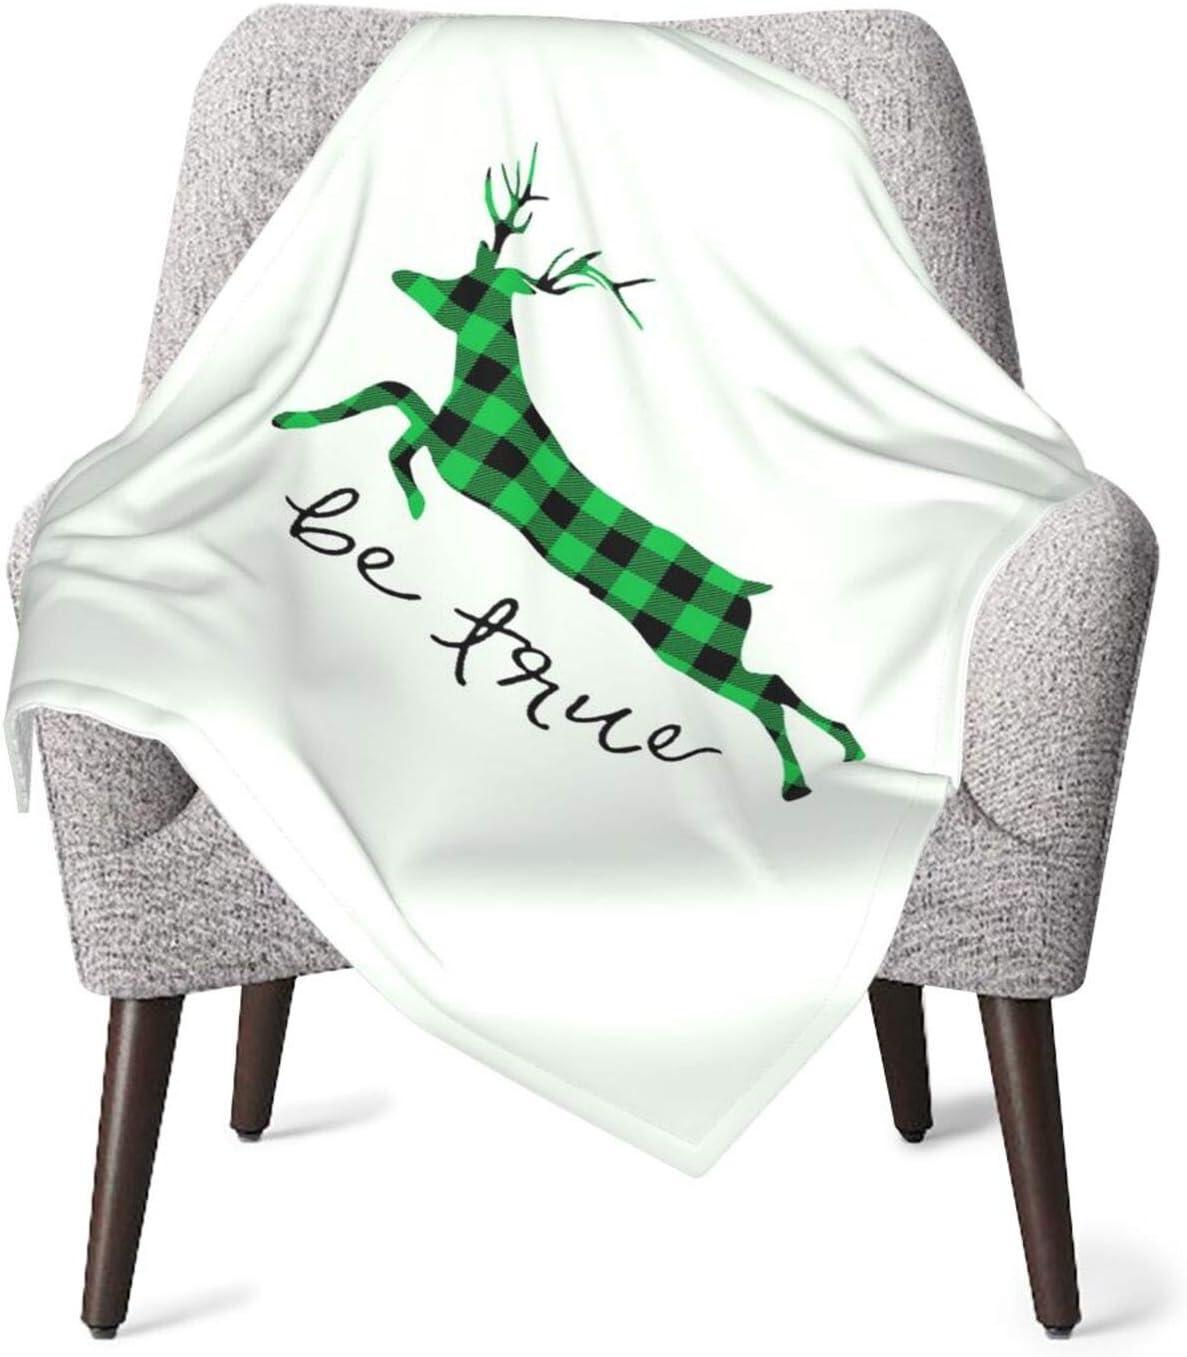 Xiongone verde y negro búfalo a cuadros alces unisex bebé suave felpa manta abrigo abrigo recibir manta para bebé o recién nacido